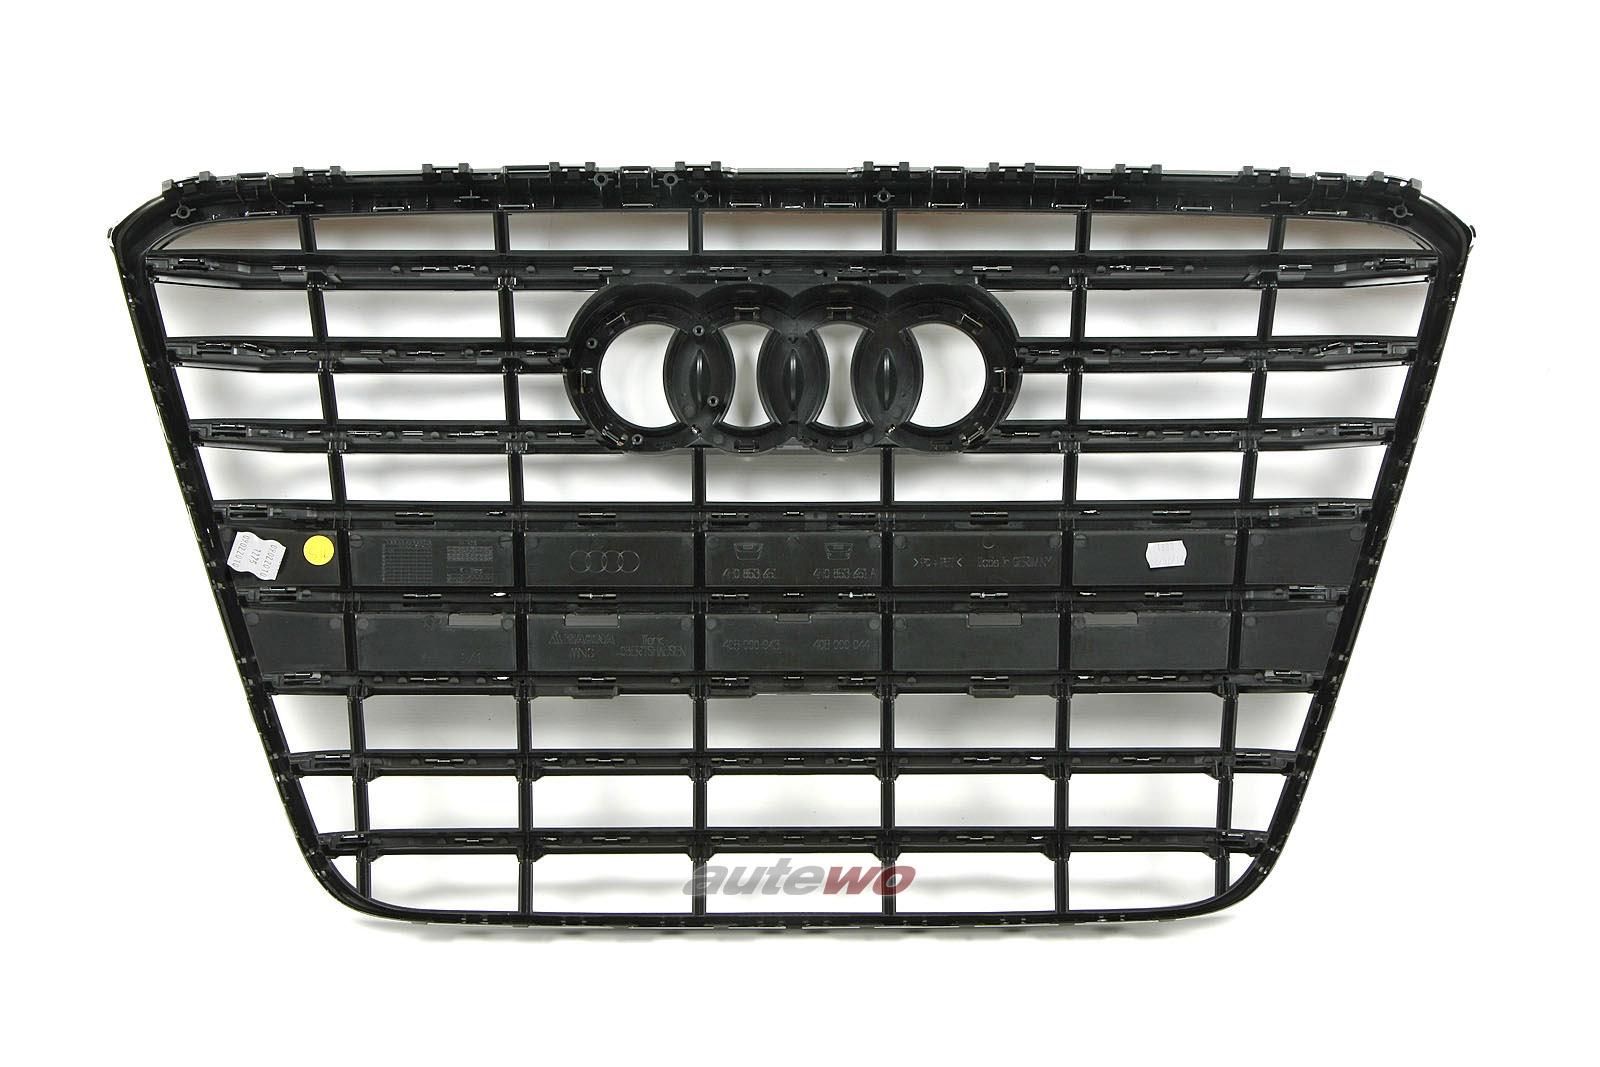 4H0853651G NEU Audi A8 D4/4H Kühlergrill schwarz glänzend